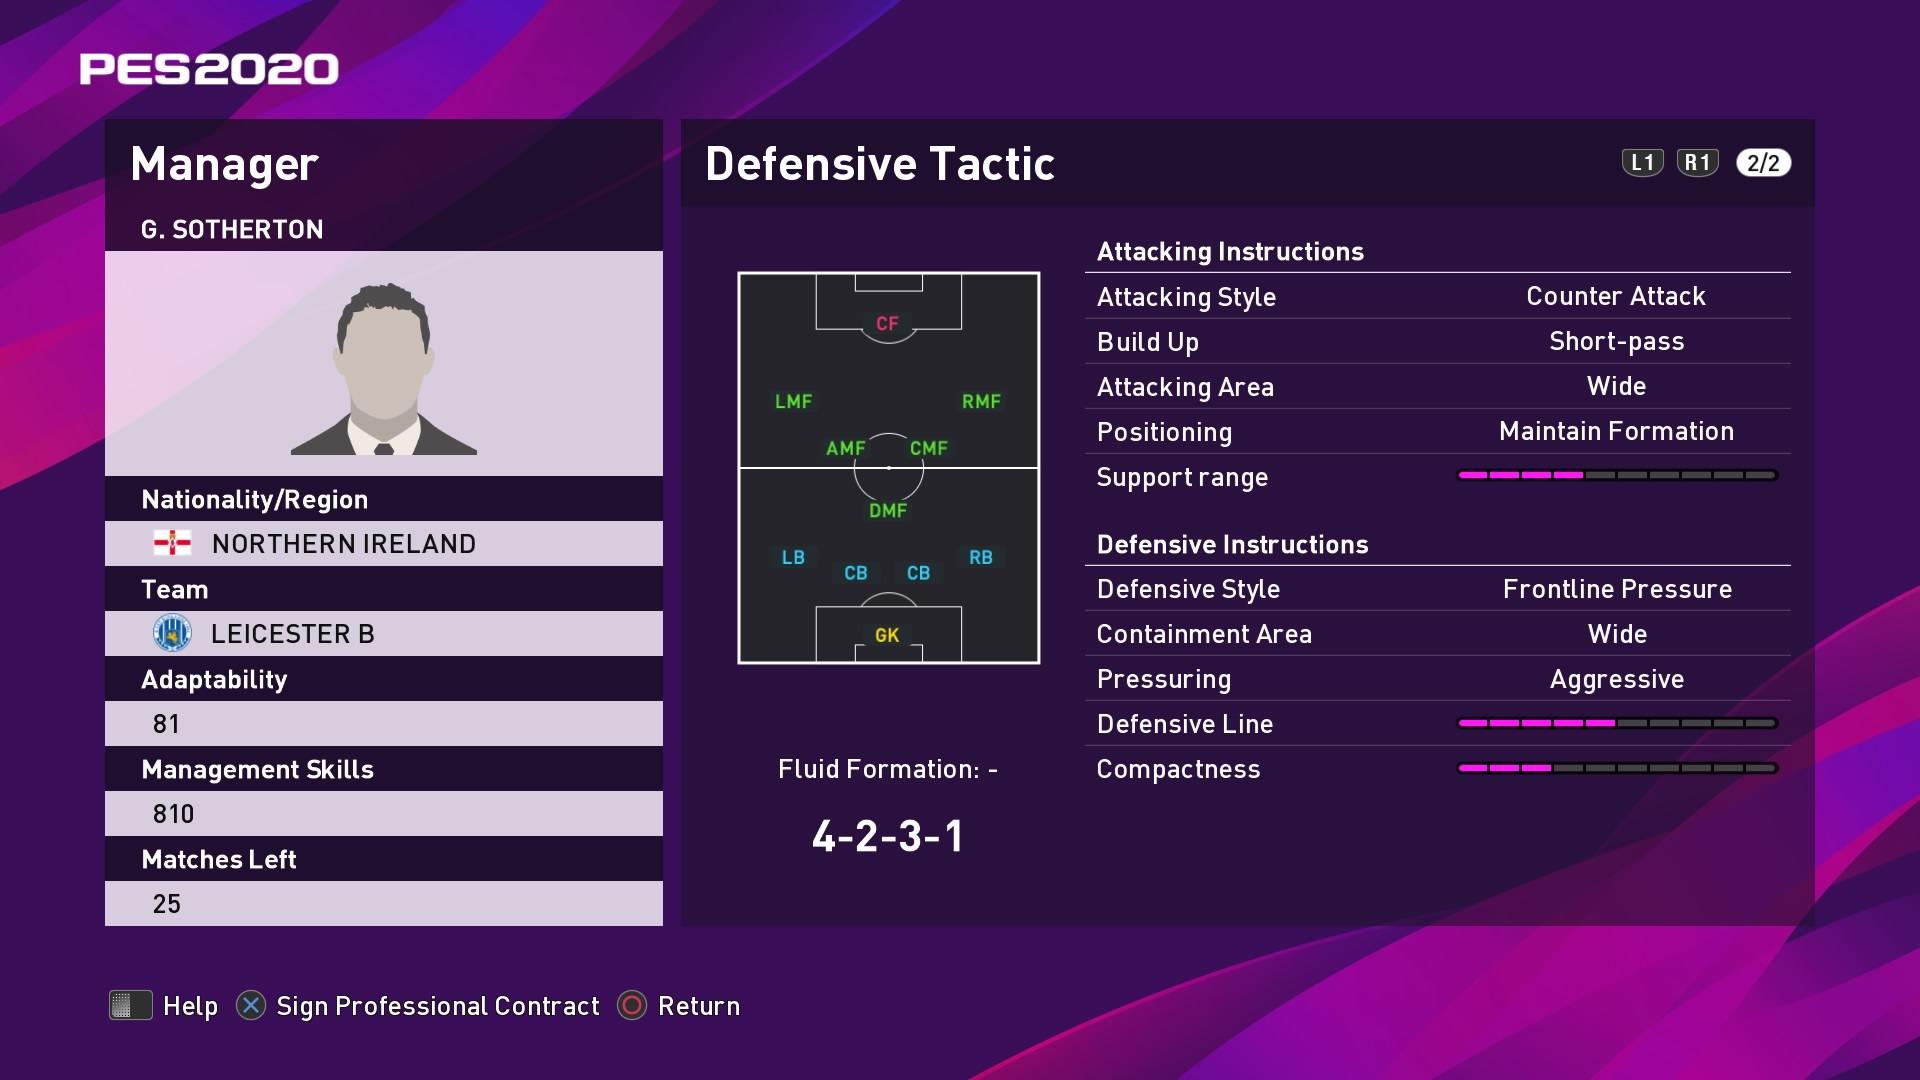 G. Sotherton (3) (Brendan Rodgers) Defensive Tactic in PES 2020 myClub